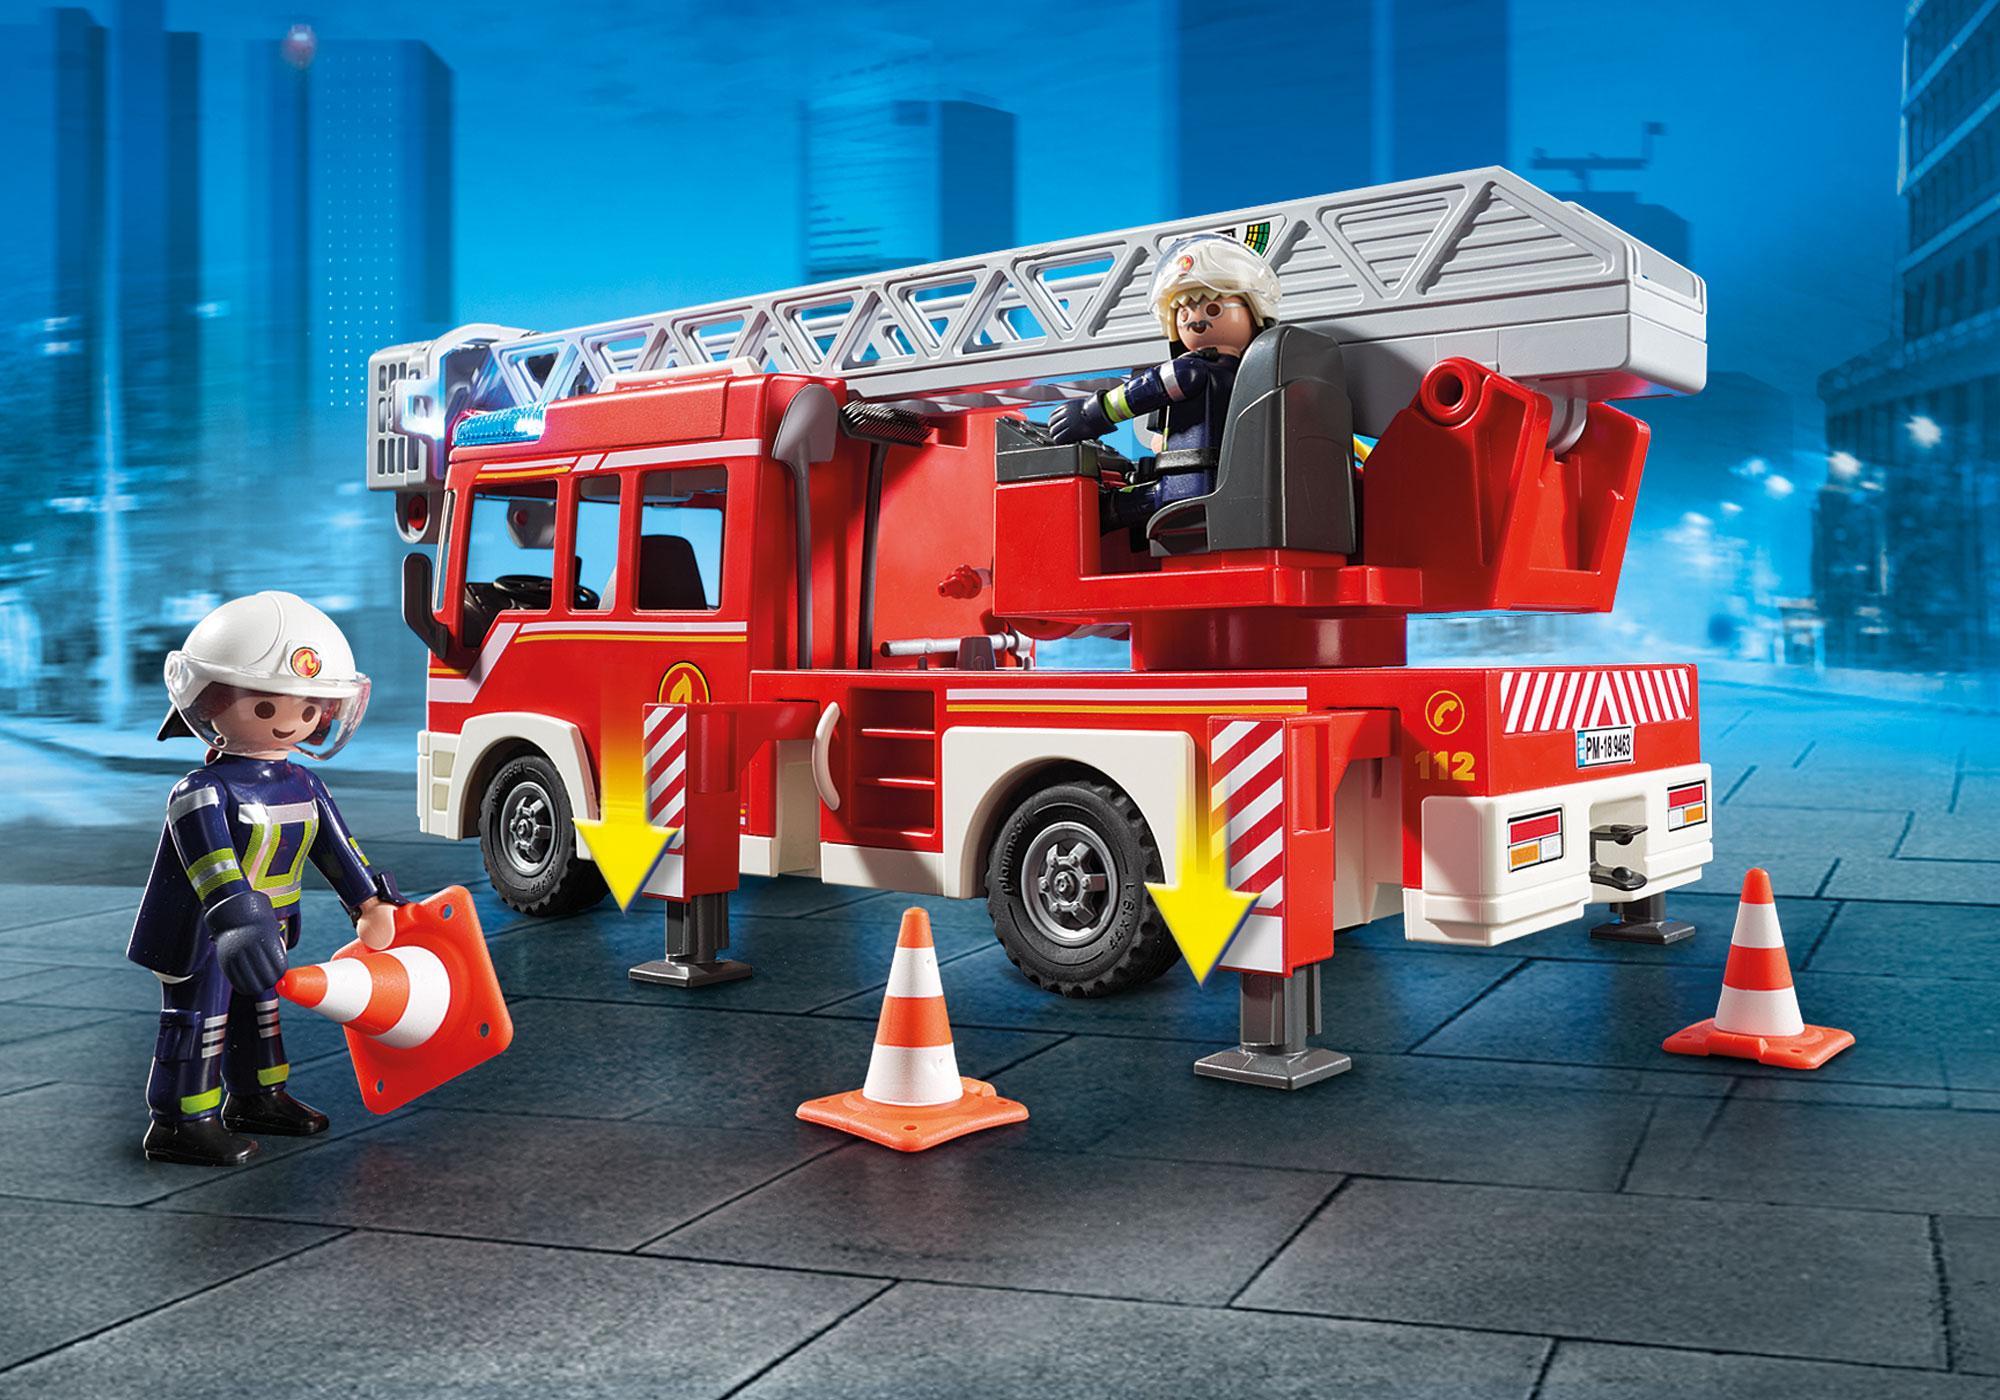 http://media.playmobil.com/i/playmobil/9463_product_extra2/Όχημα Πυροσβεστικής με σκάλα και καλάθι διάσωσης